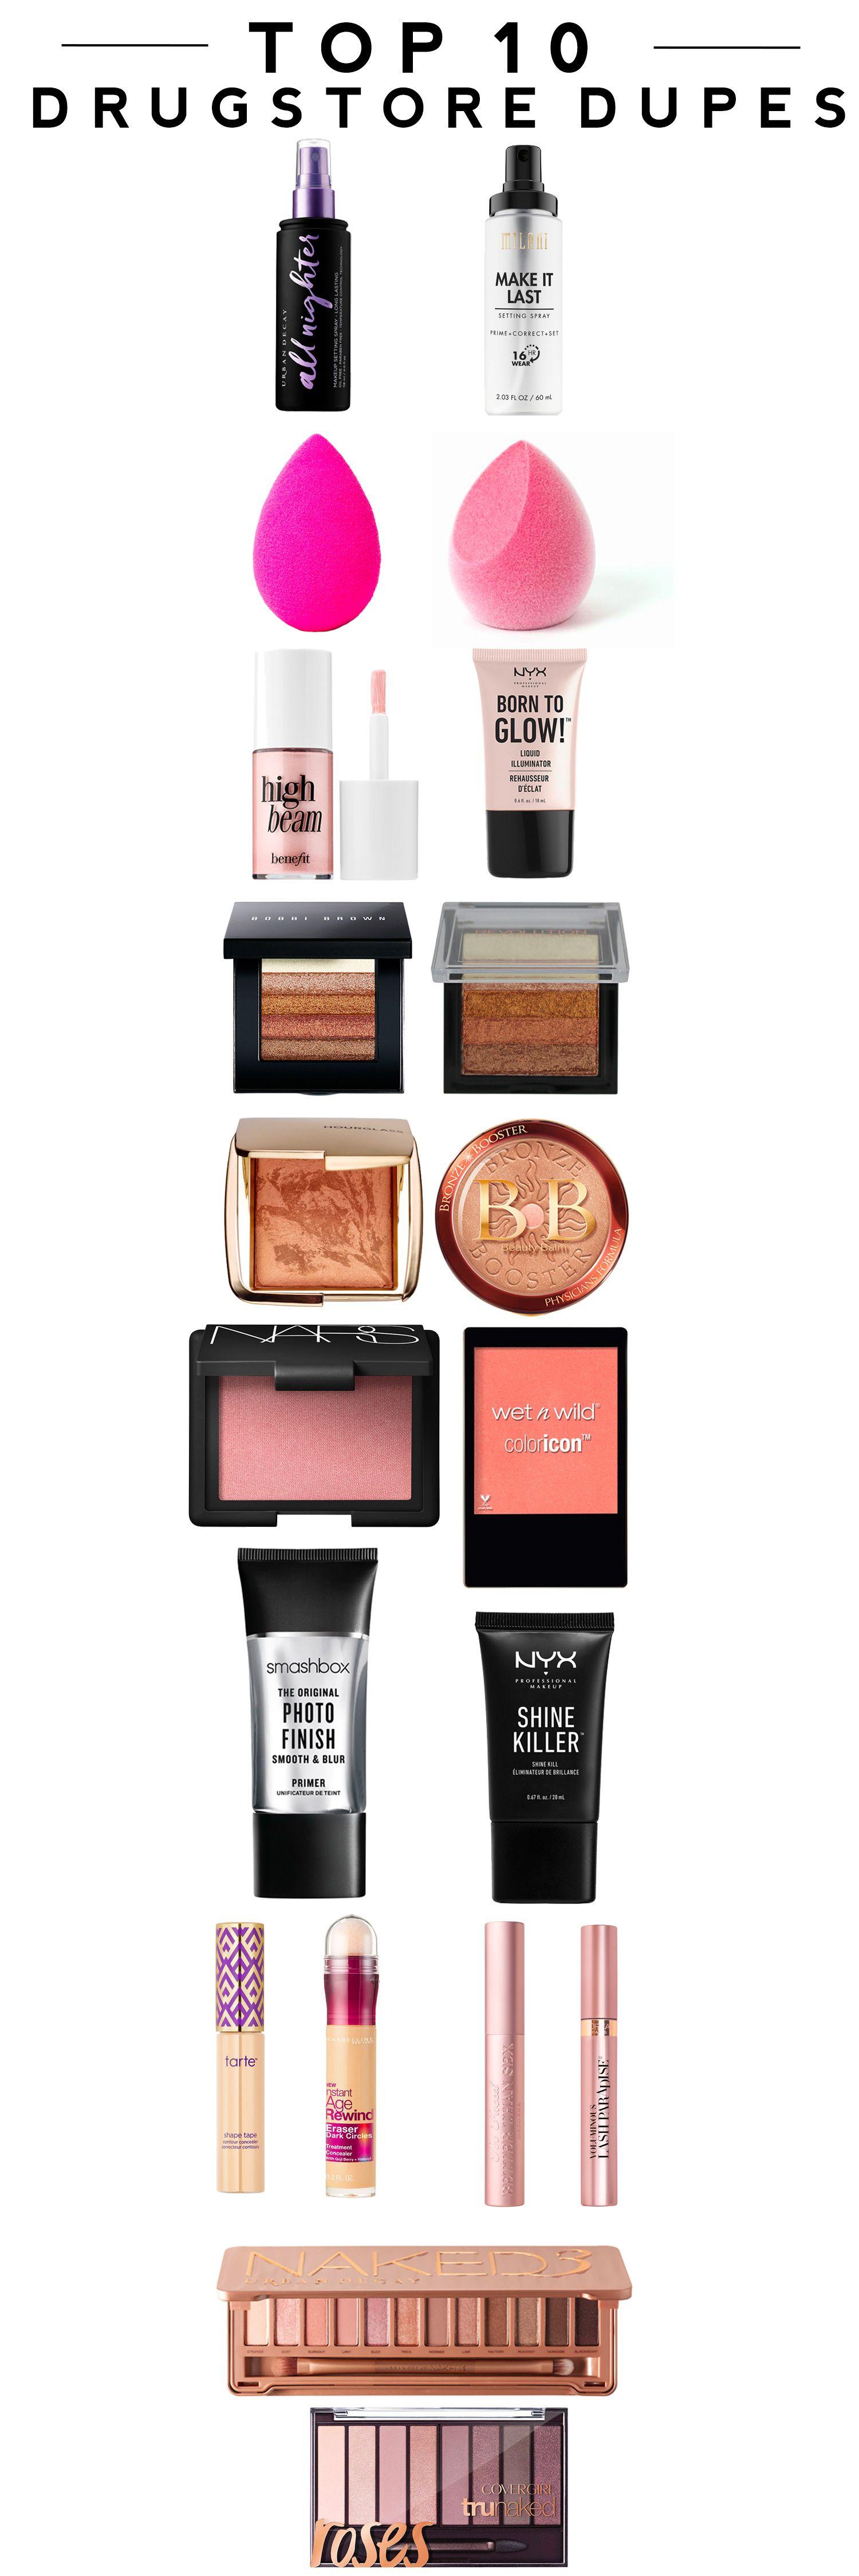 Top 10 Drugstore Makeup Dupes Drugstore makeup dupes